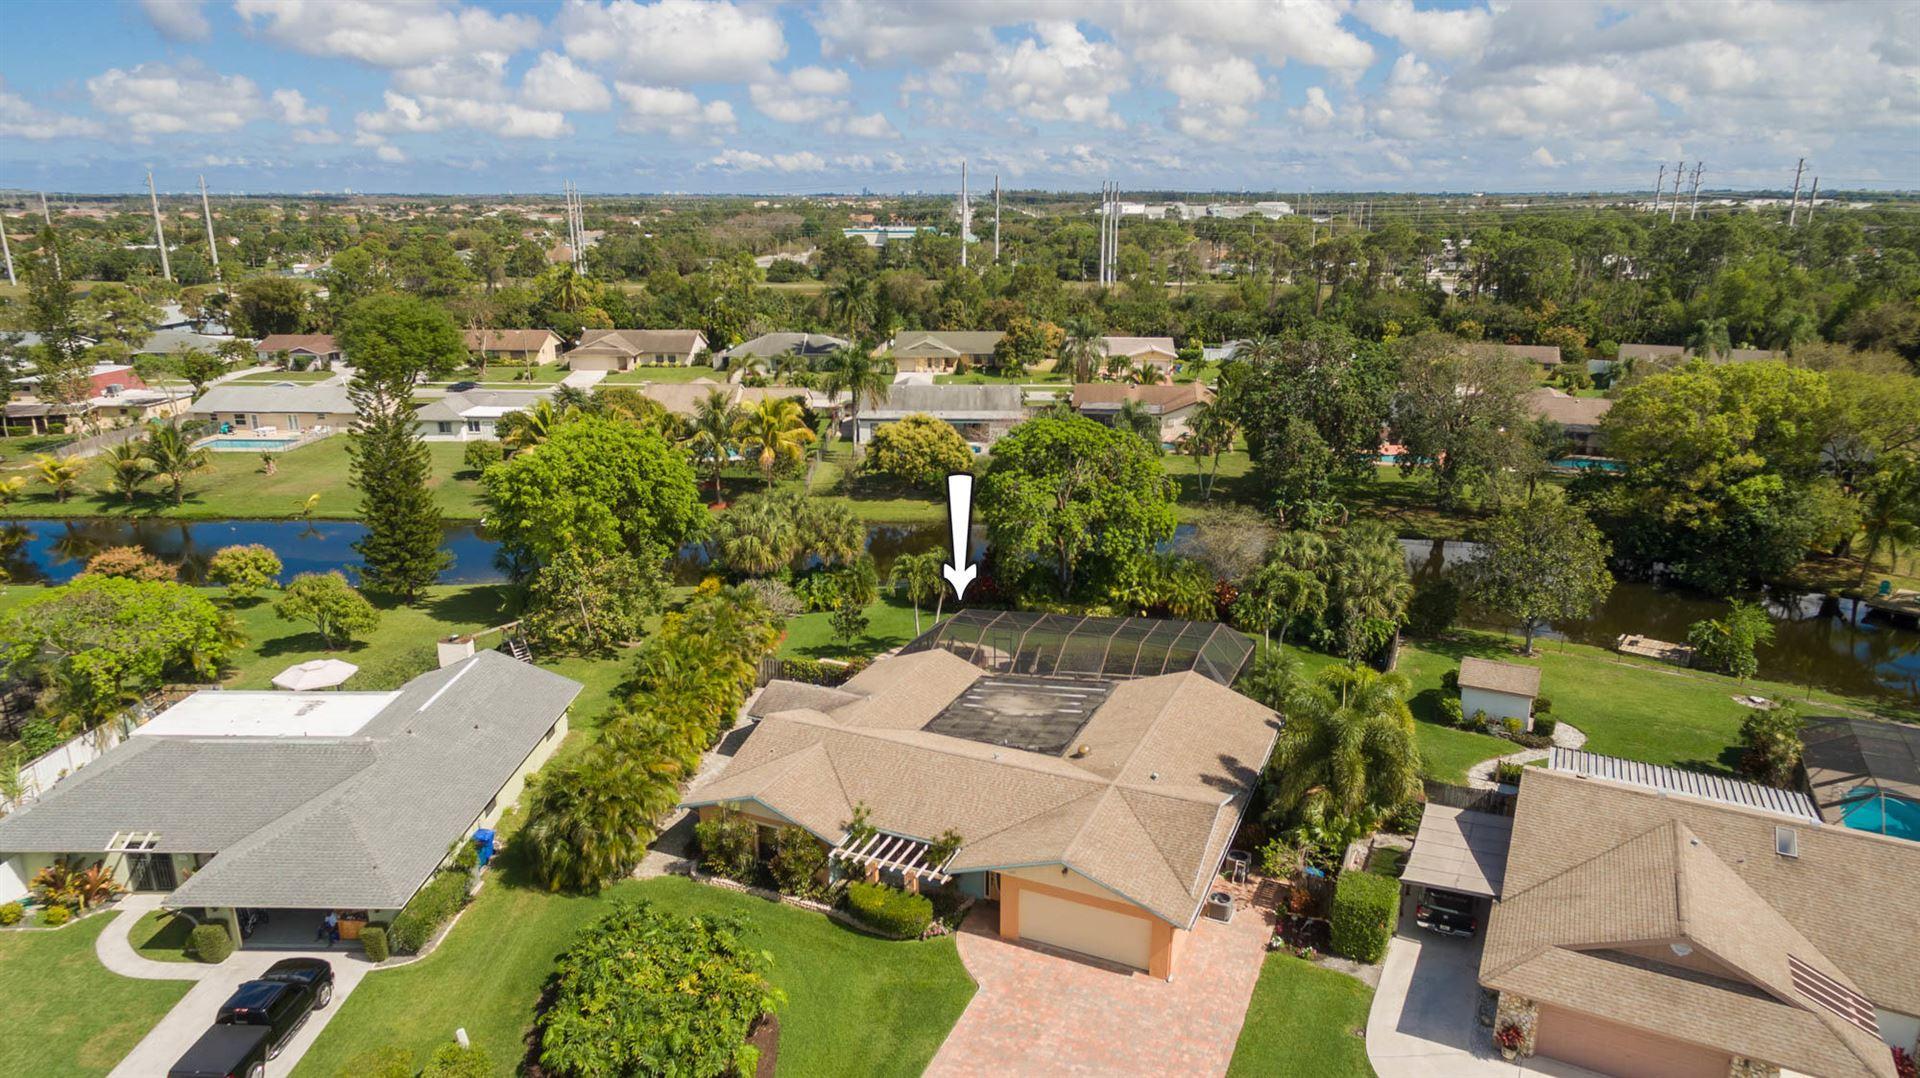 109 Galiano Street, Royal Palm Beach, FL 33411 - #: RX-10696401